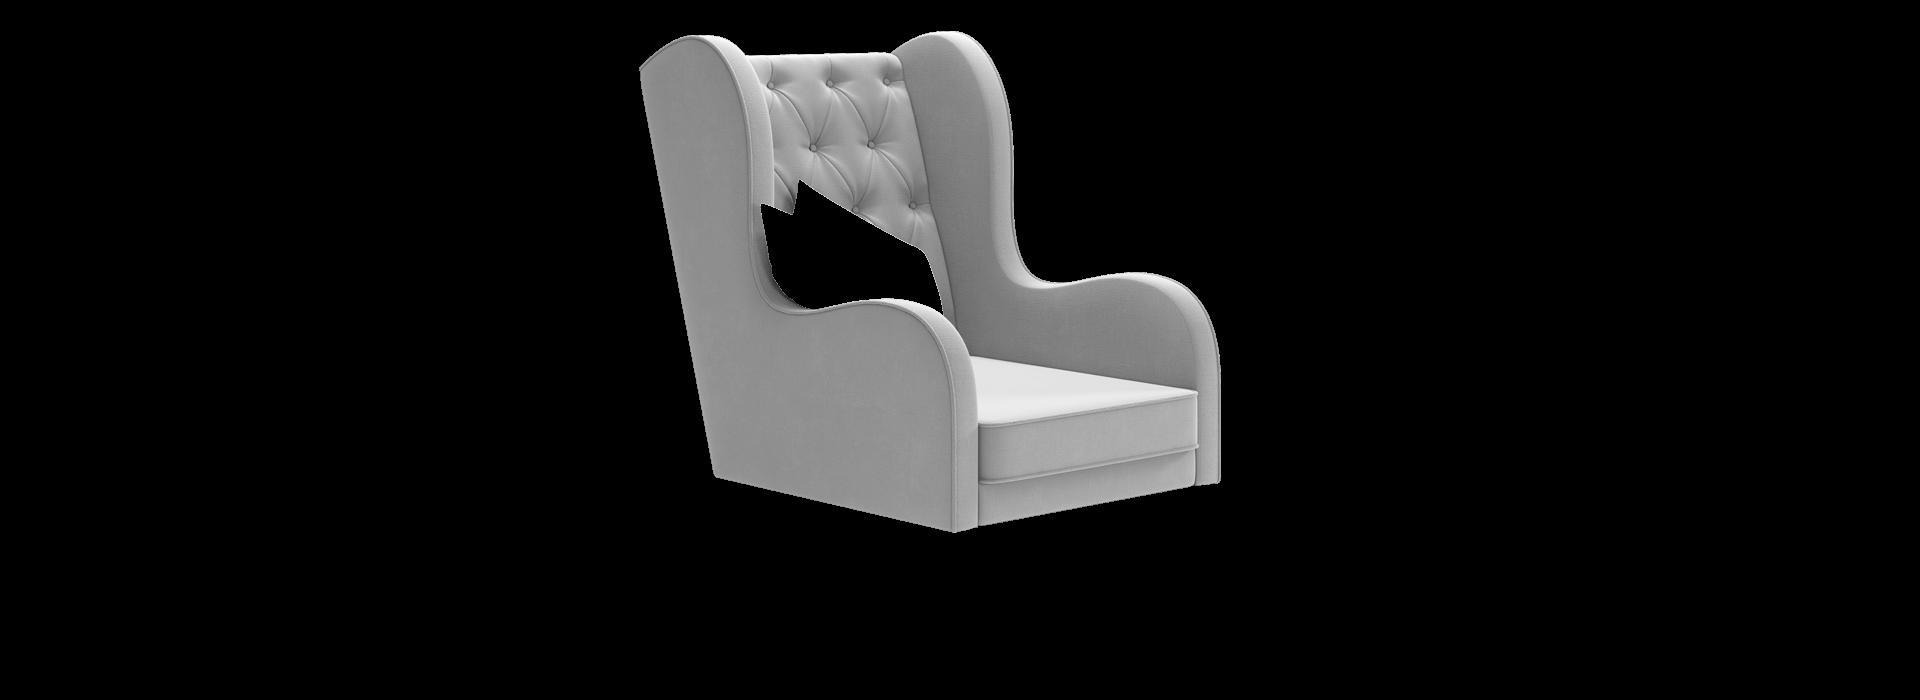 Майа C крісло - маска 1